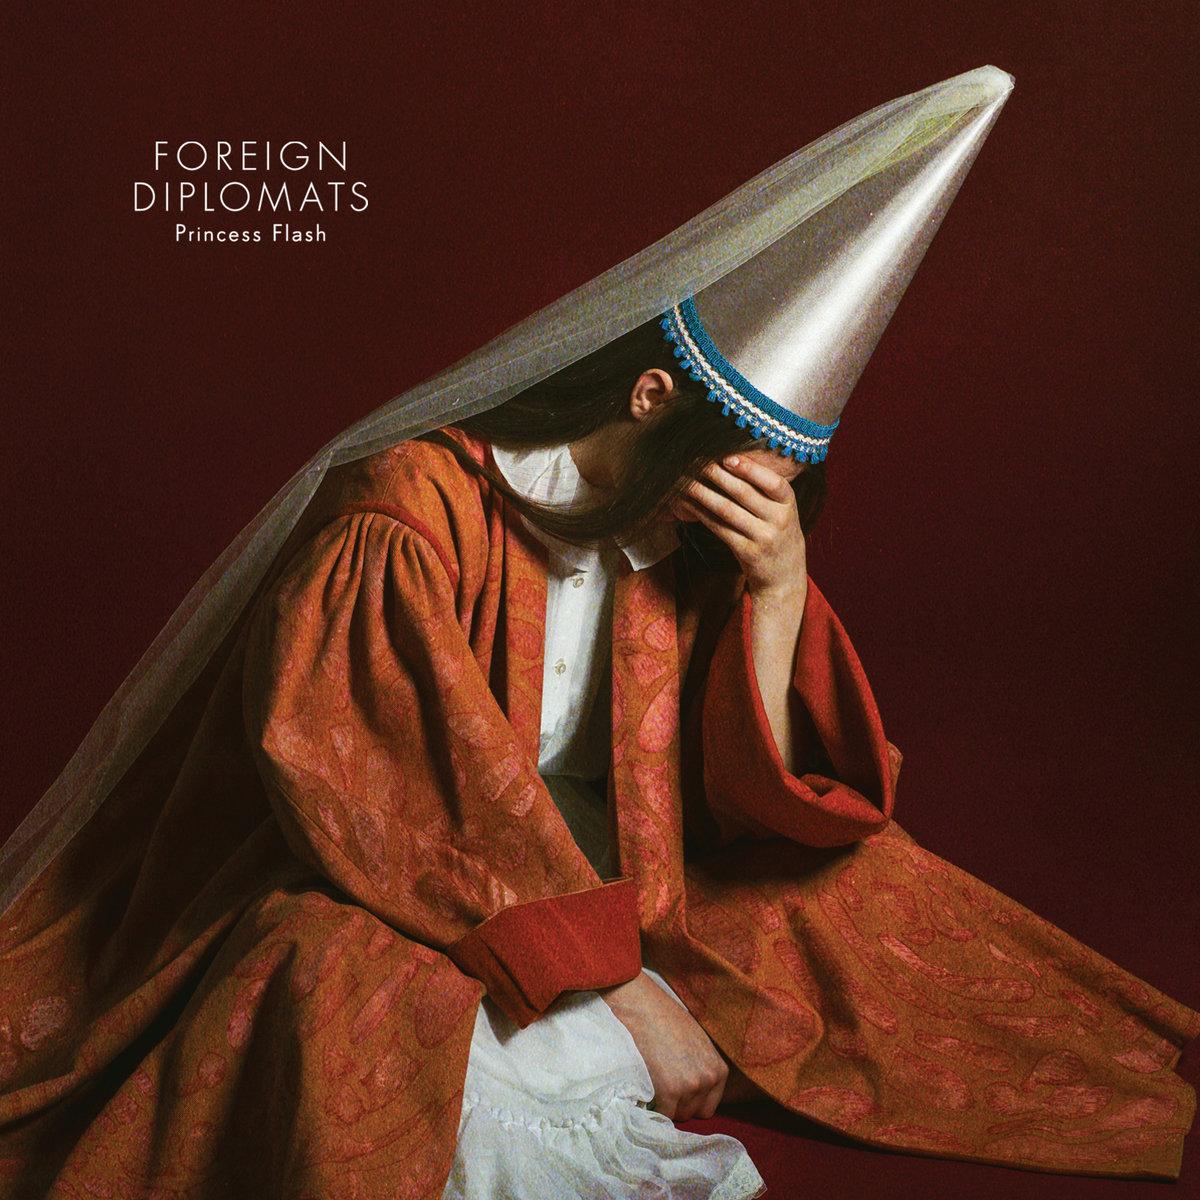 Foreign Diplomats - Princess Flash (2015) [FLAC] Download